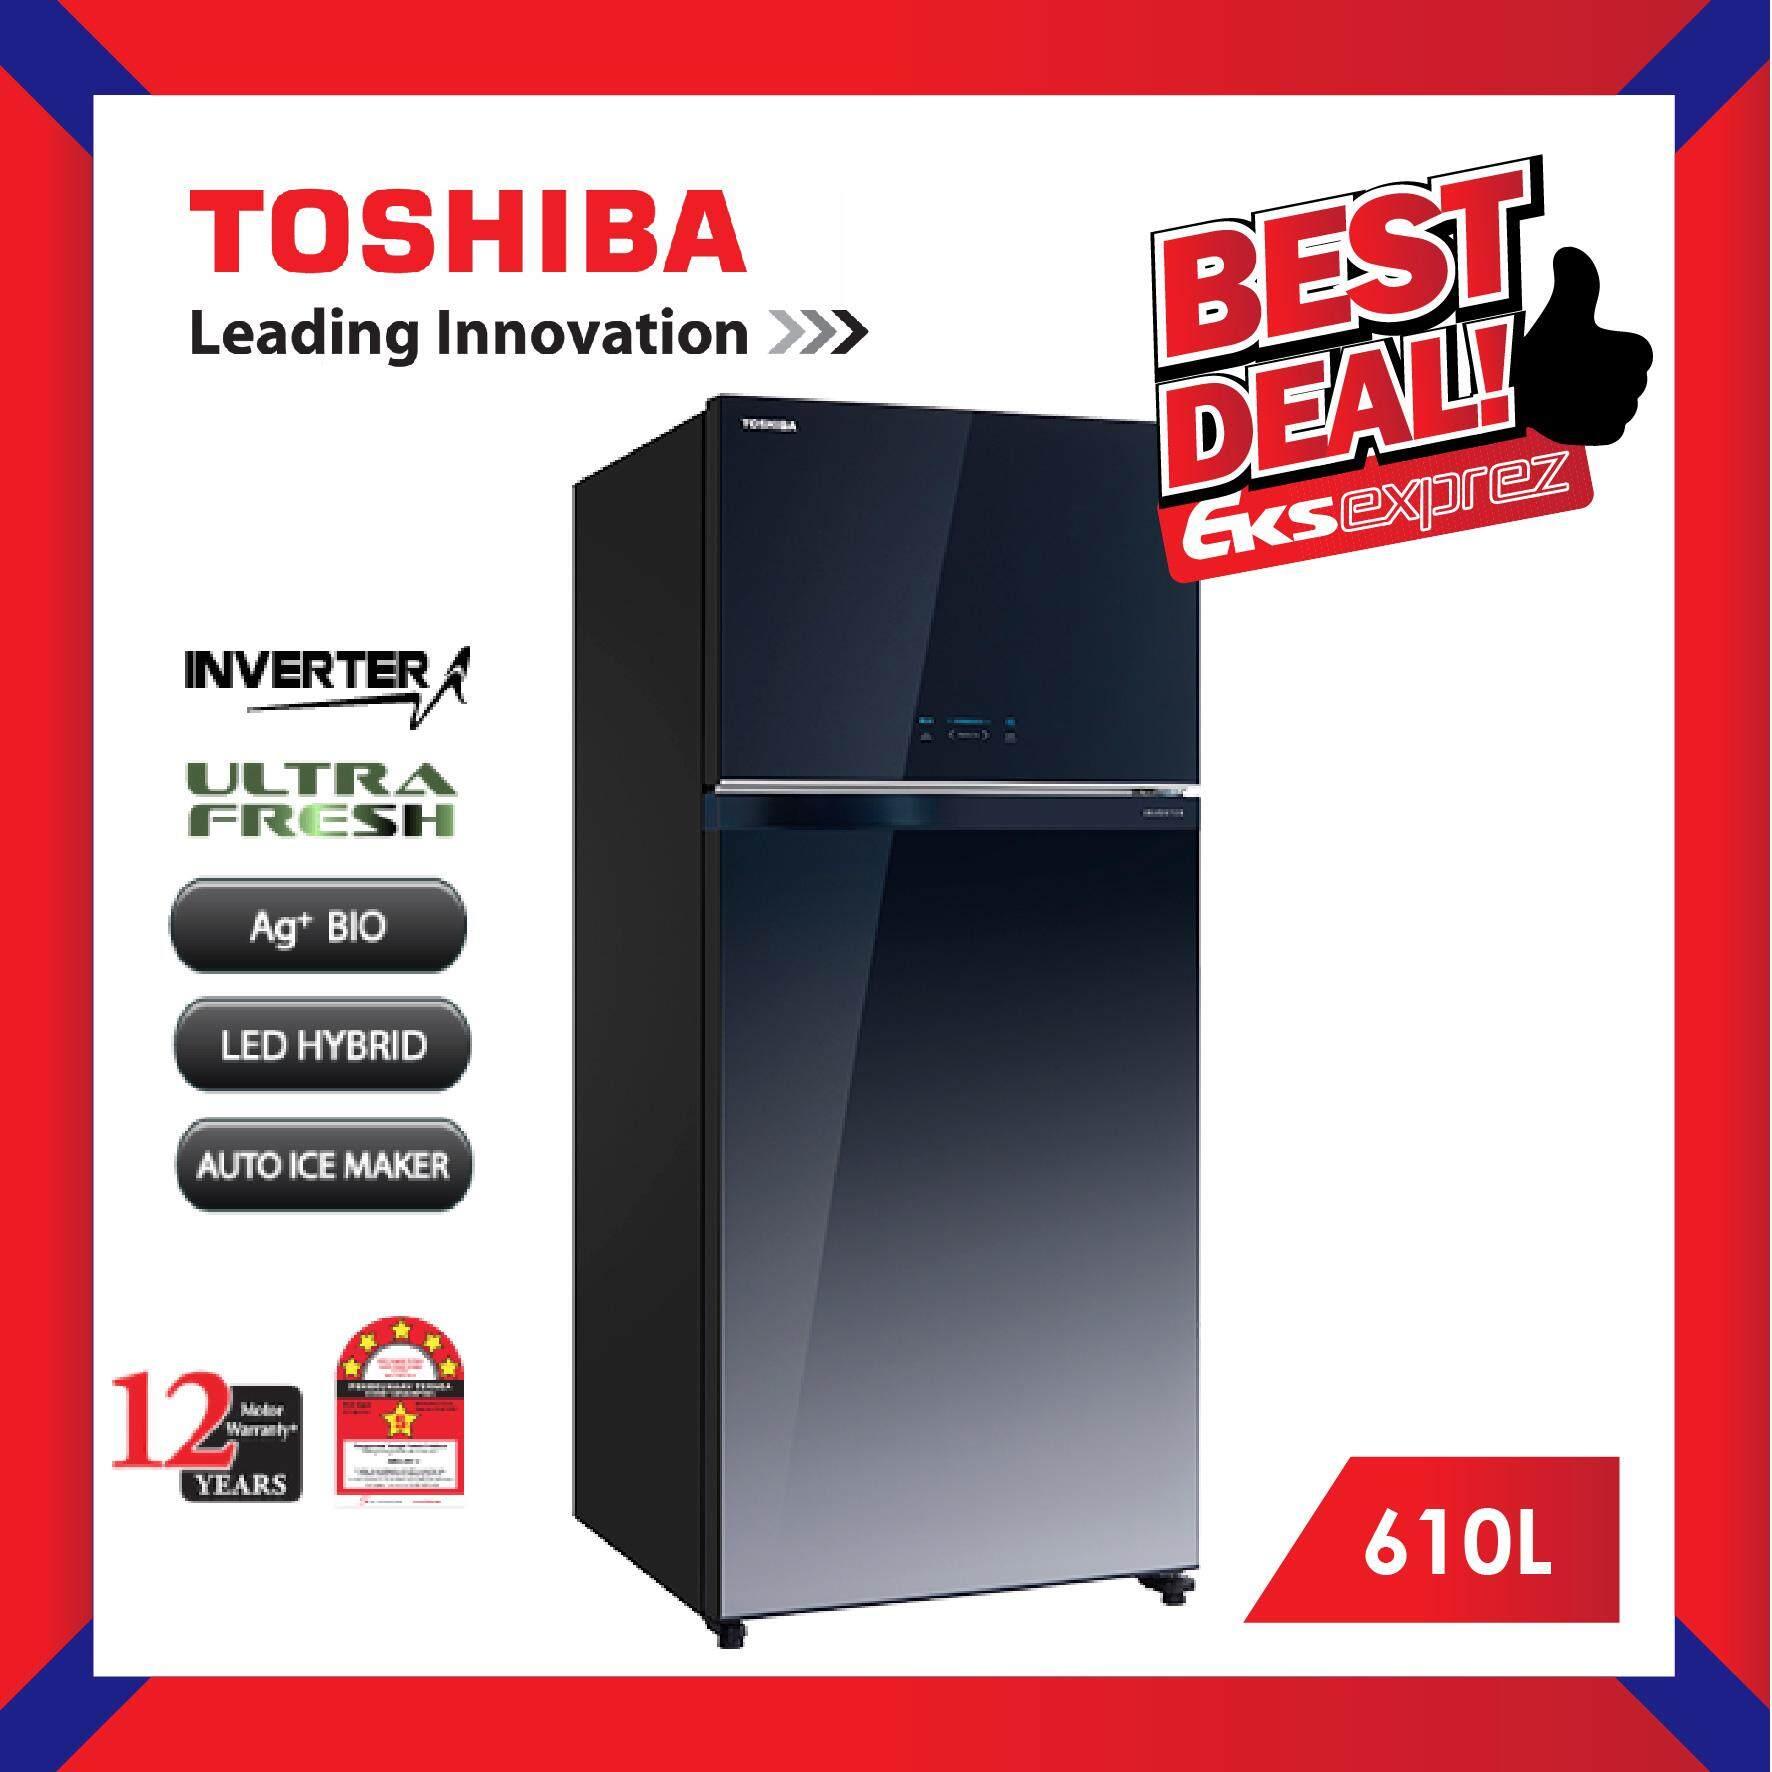 Toshiba GR-AG58MA (GG) 610L 2 Door Duo Hybrid, Inverter Fridge Refrigerator with Ag+ BIO Deodorizer